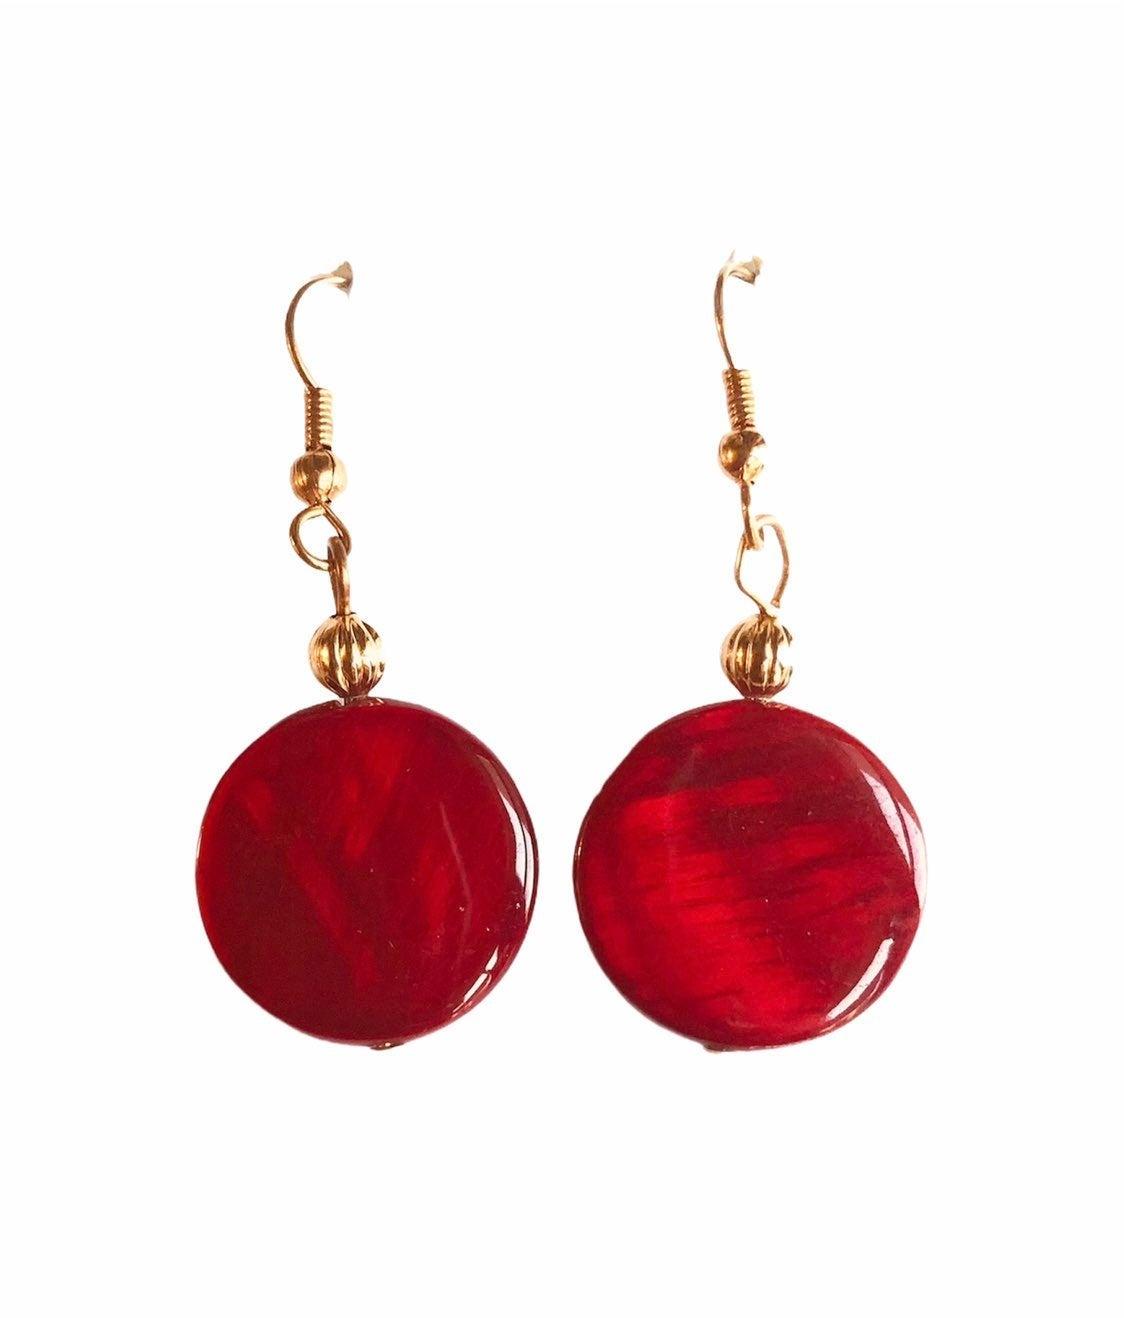 Red Earrings - new